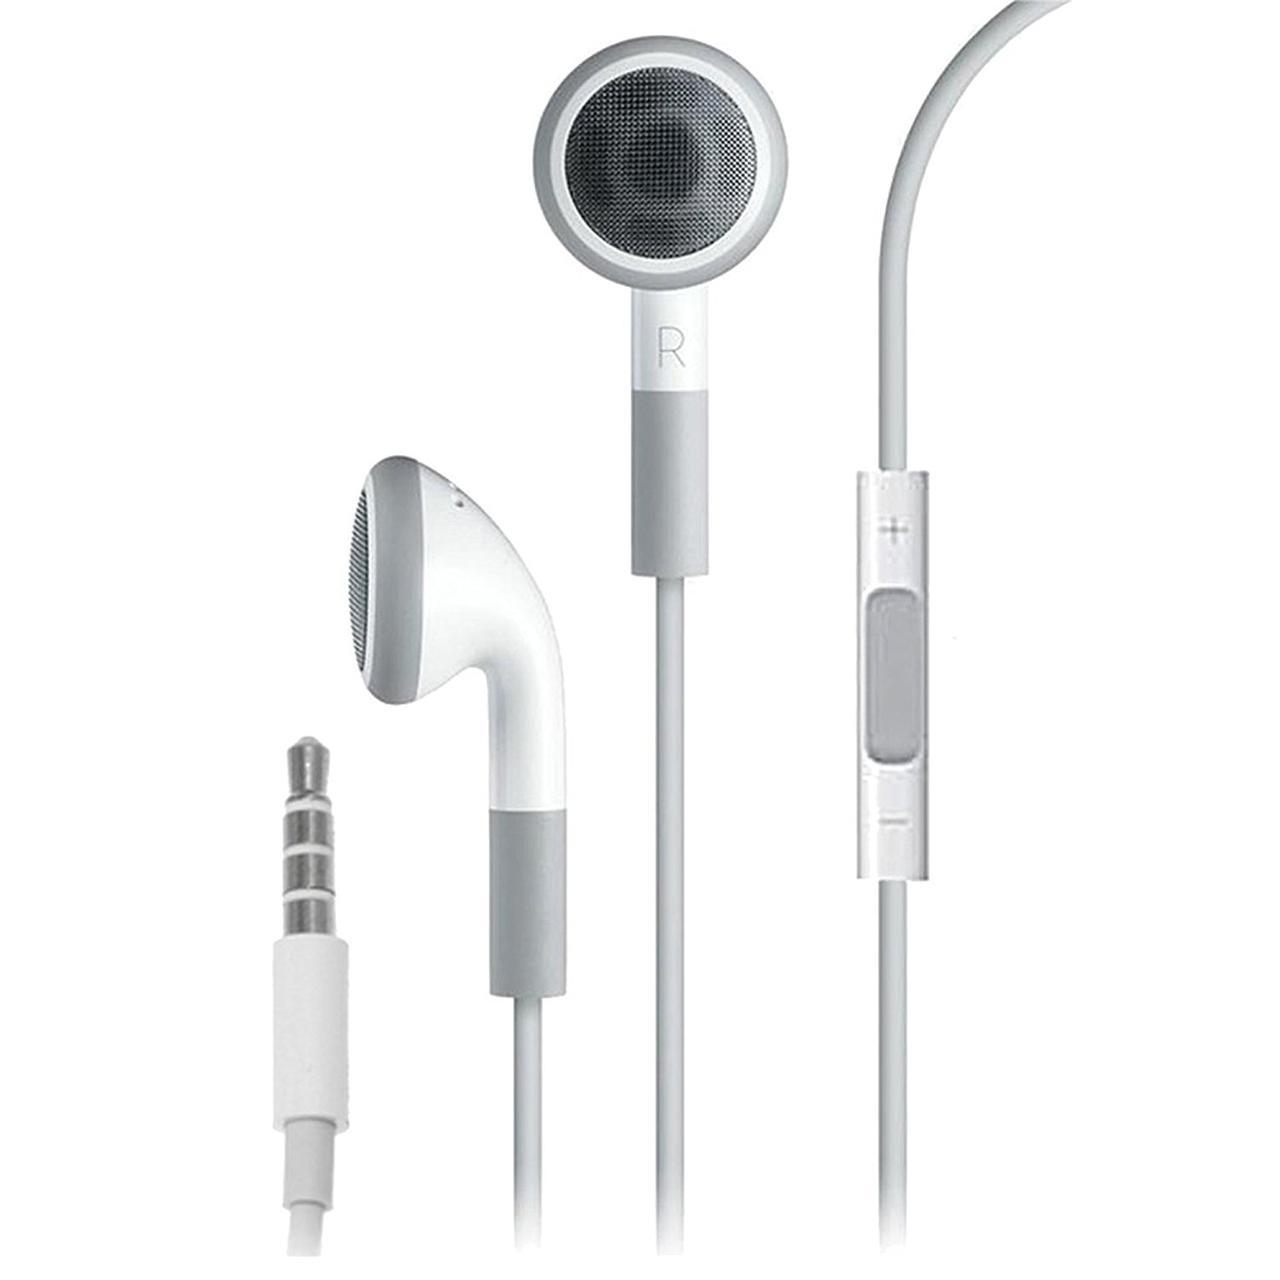 Оригинальные Наушники Apple EarPods iPhone 3GS   4   4S Original ... 4638ac8a6045a